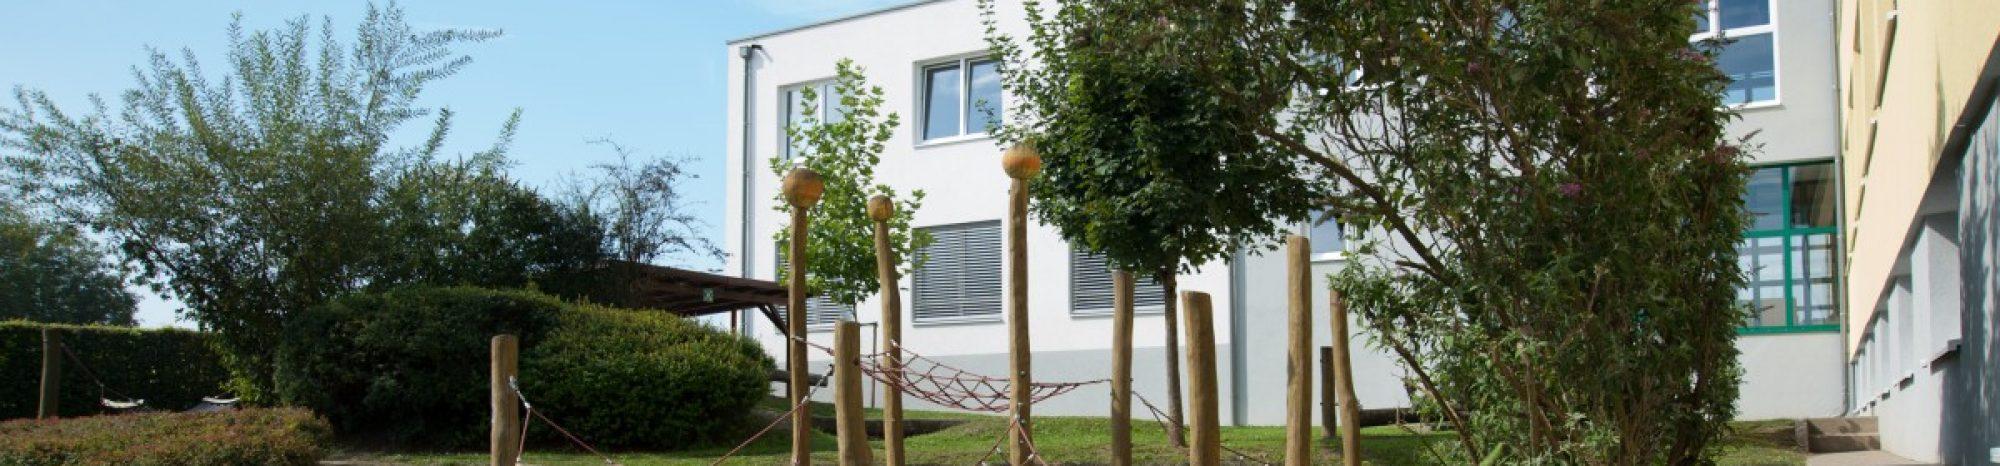 Volksschule Wallsee-Sindelburg